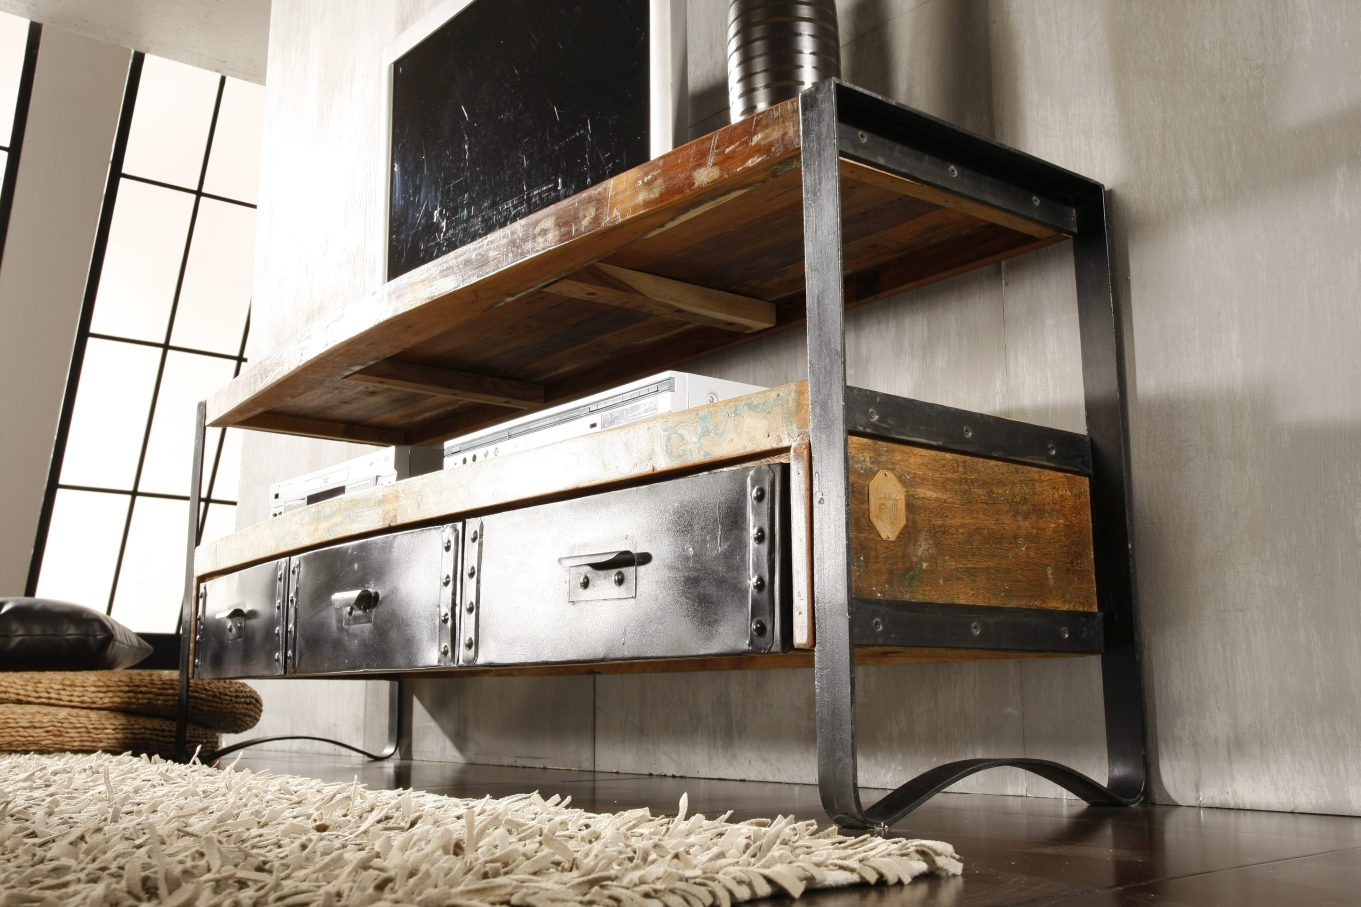 industrial szafka rtv 05 metal drewno z odzysku industrial meble kolonialne 24. Black Bedroom Furniture Sets. Home Design Ideas